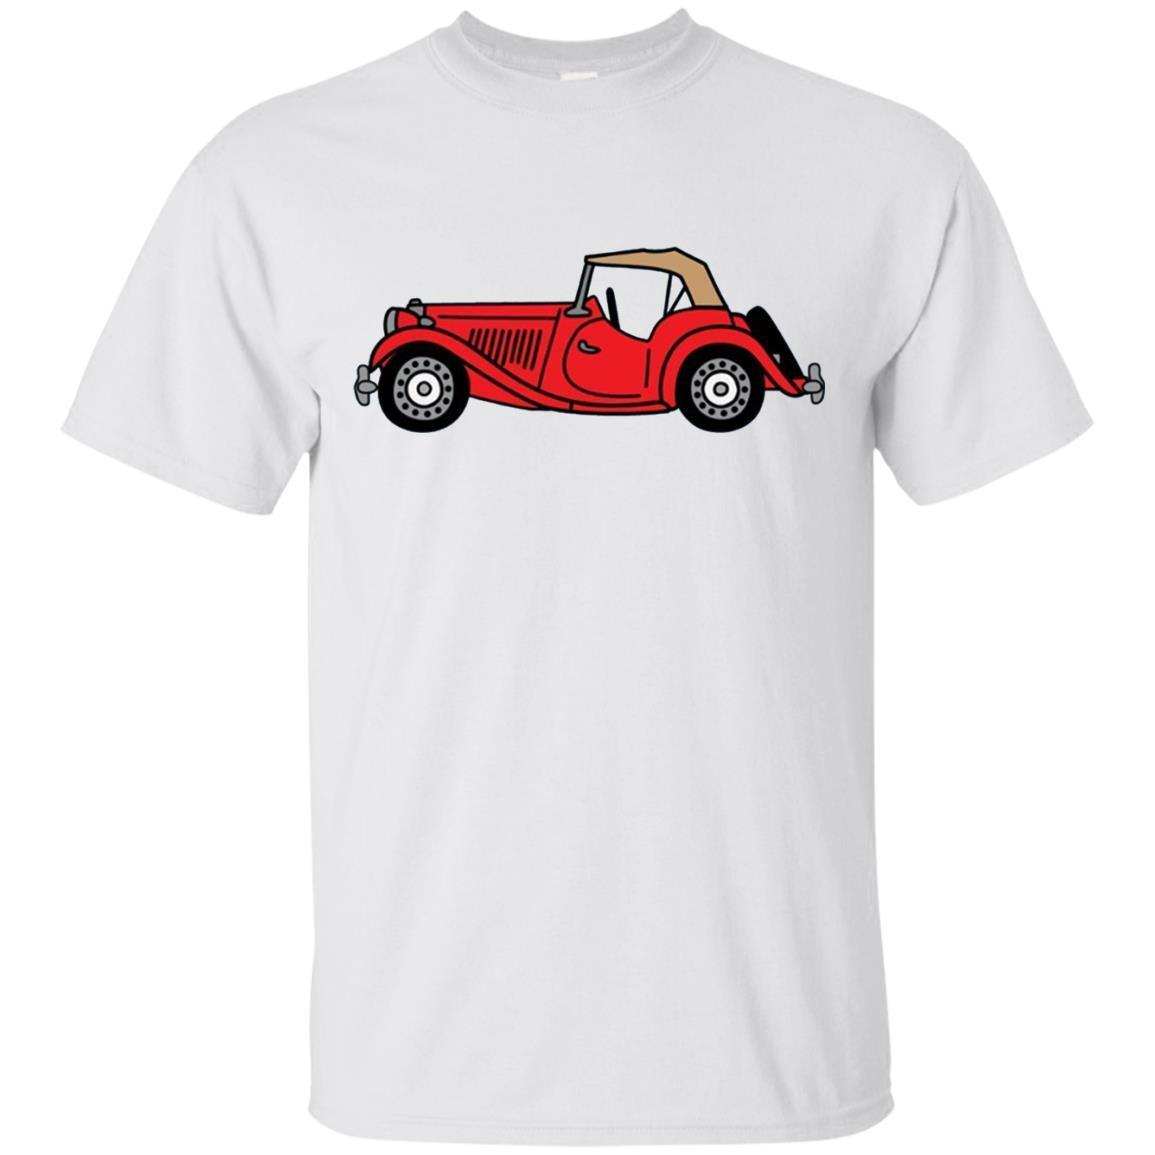 MGTD MG TD Red British Classic Sportscar T-shirt